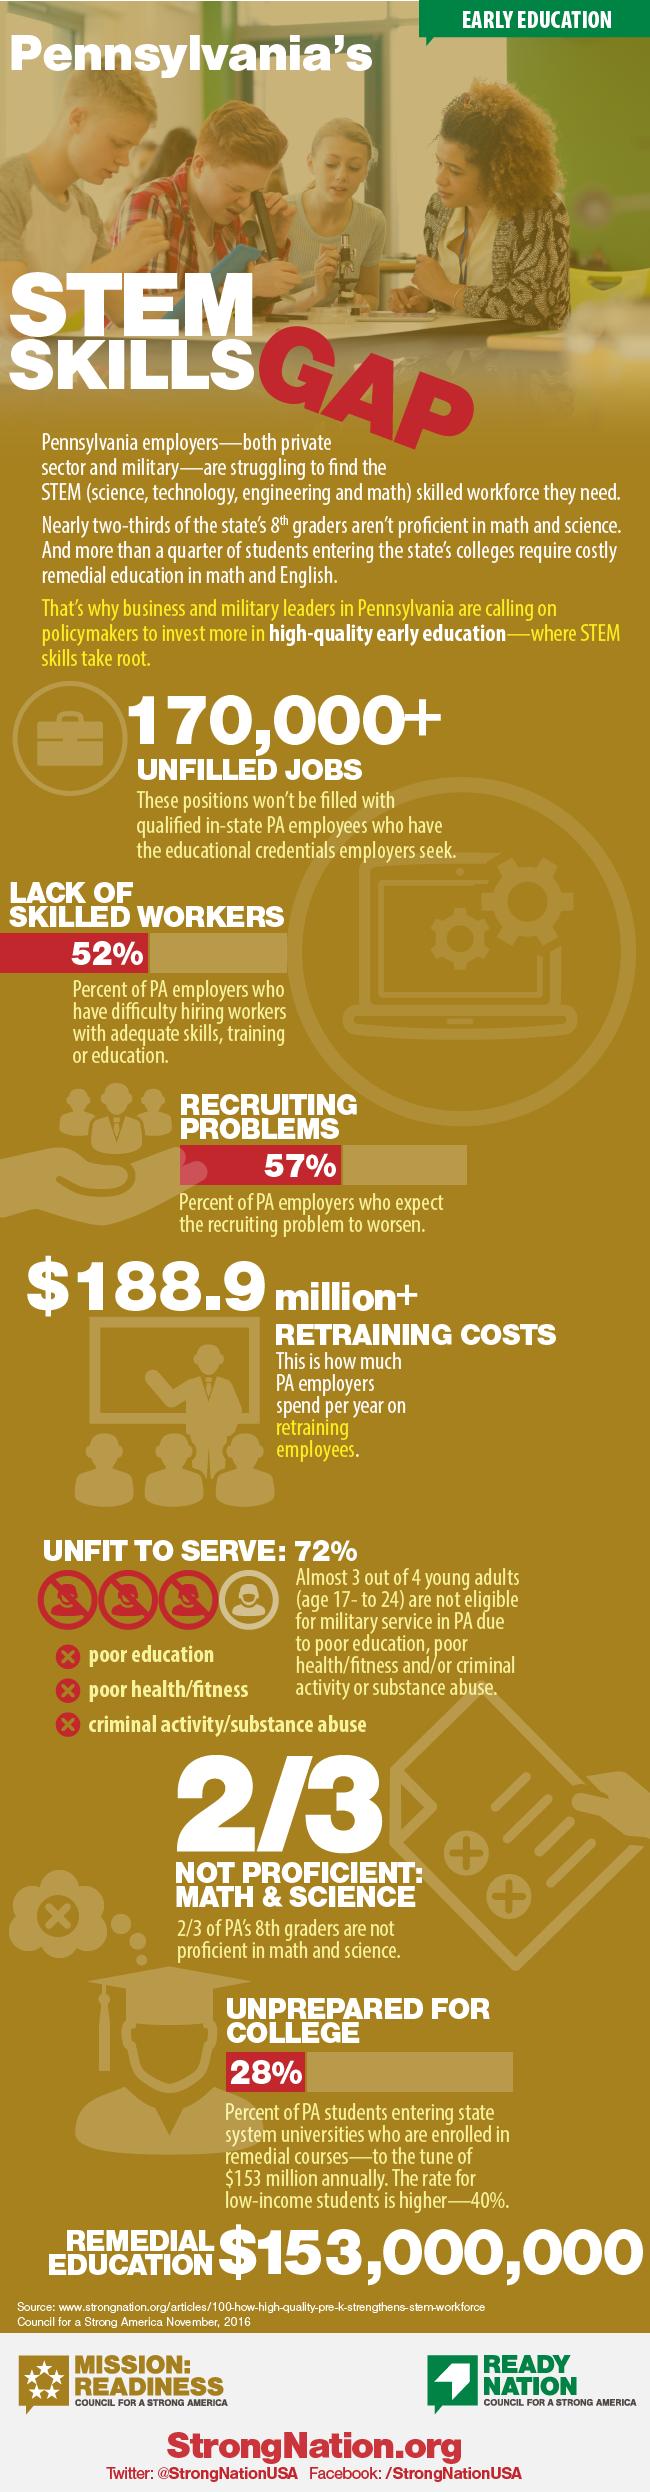 ReadyNation Pennsylvania STEM infographic